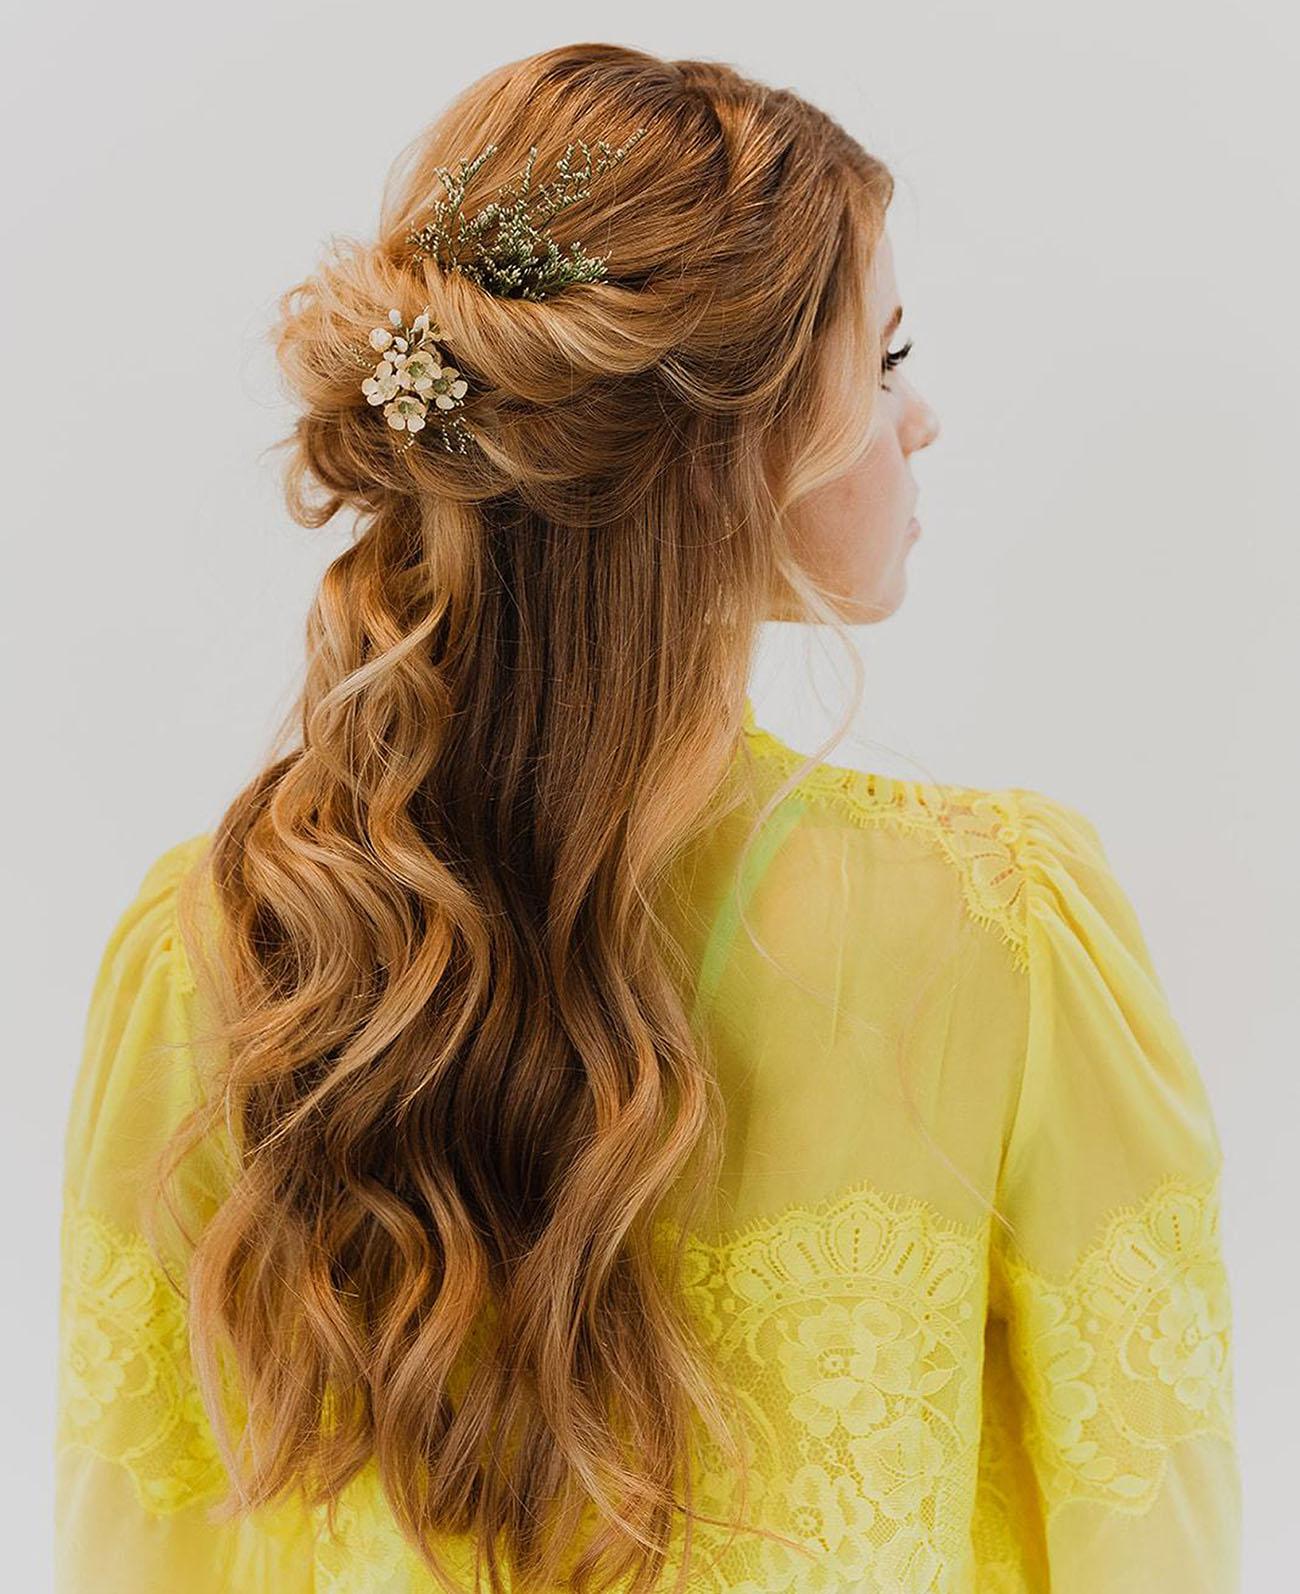 wedding hair ideas, flowers in hair, Wedding Hairstyles with Flowers